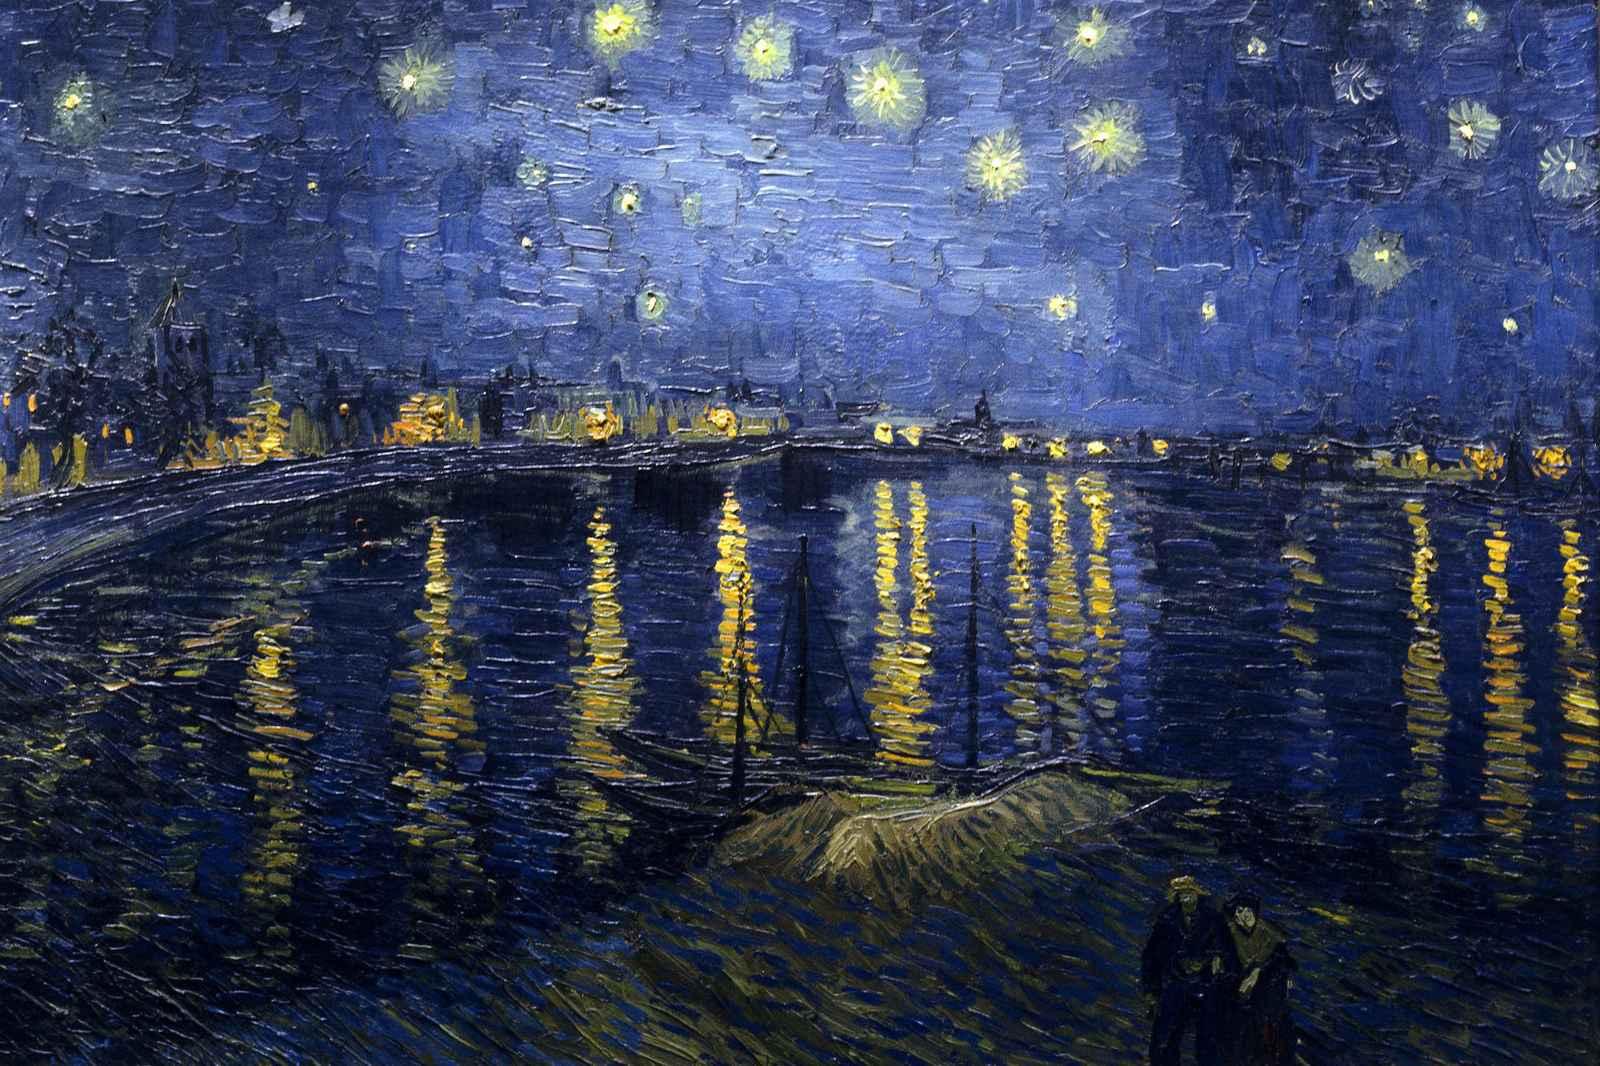 Starry_Night_Over_the_Rhone-van-gogh